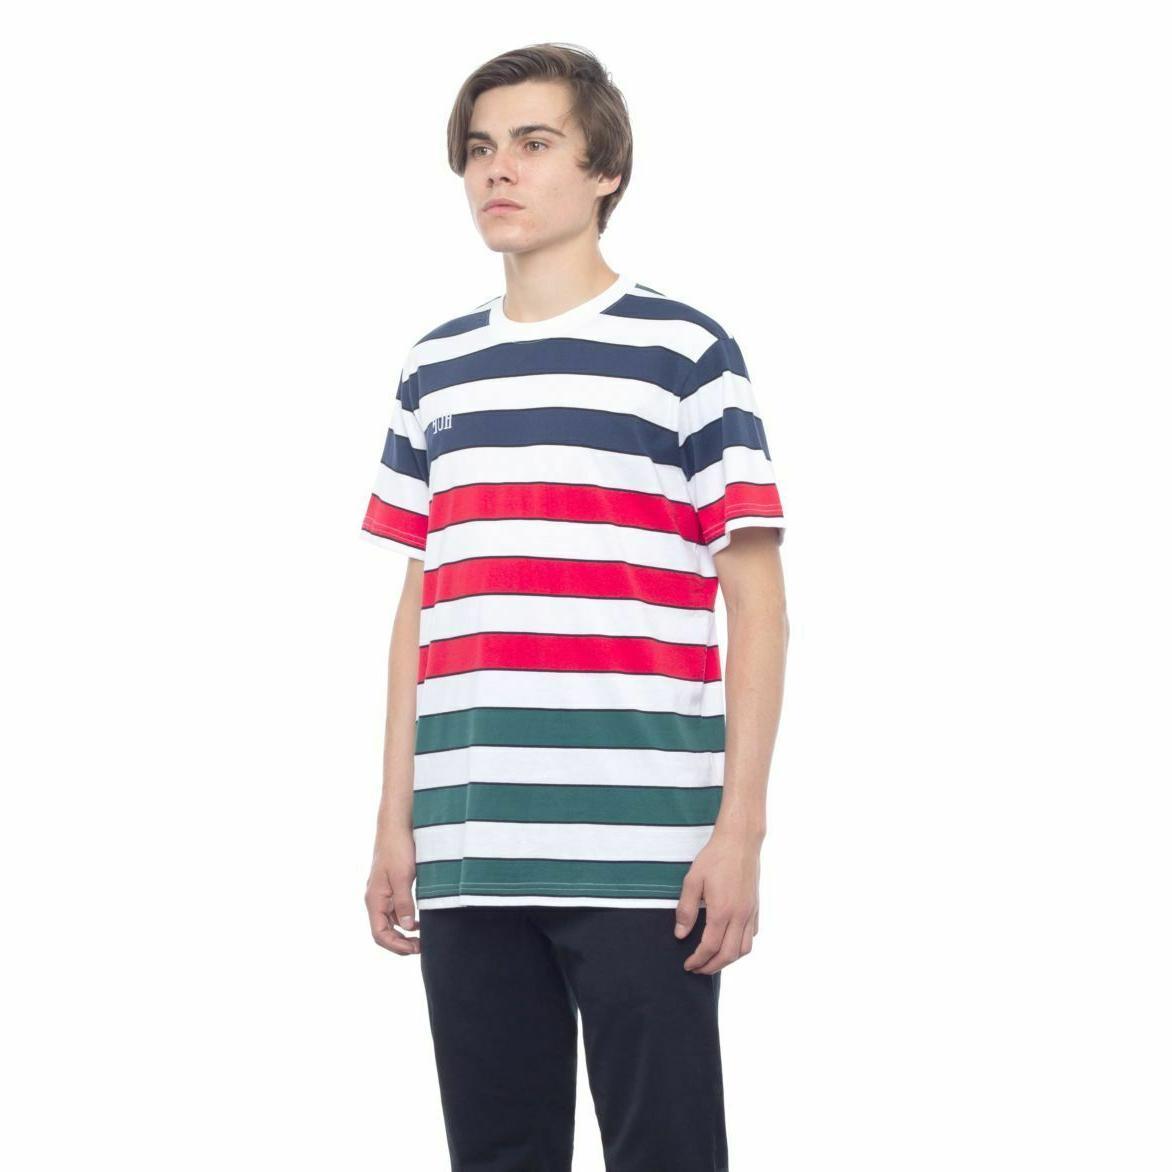 HUF Striped Mens Clothing TOP T-SHIRT